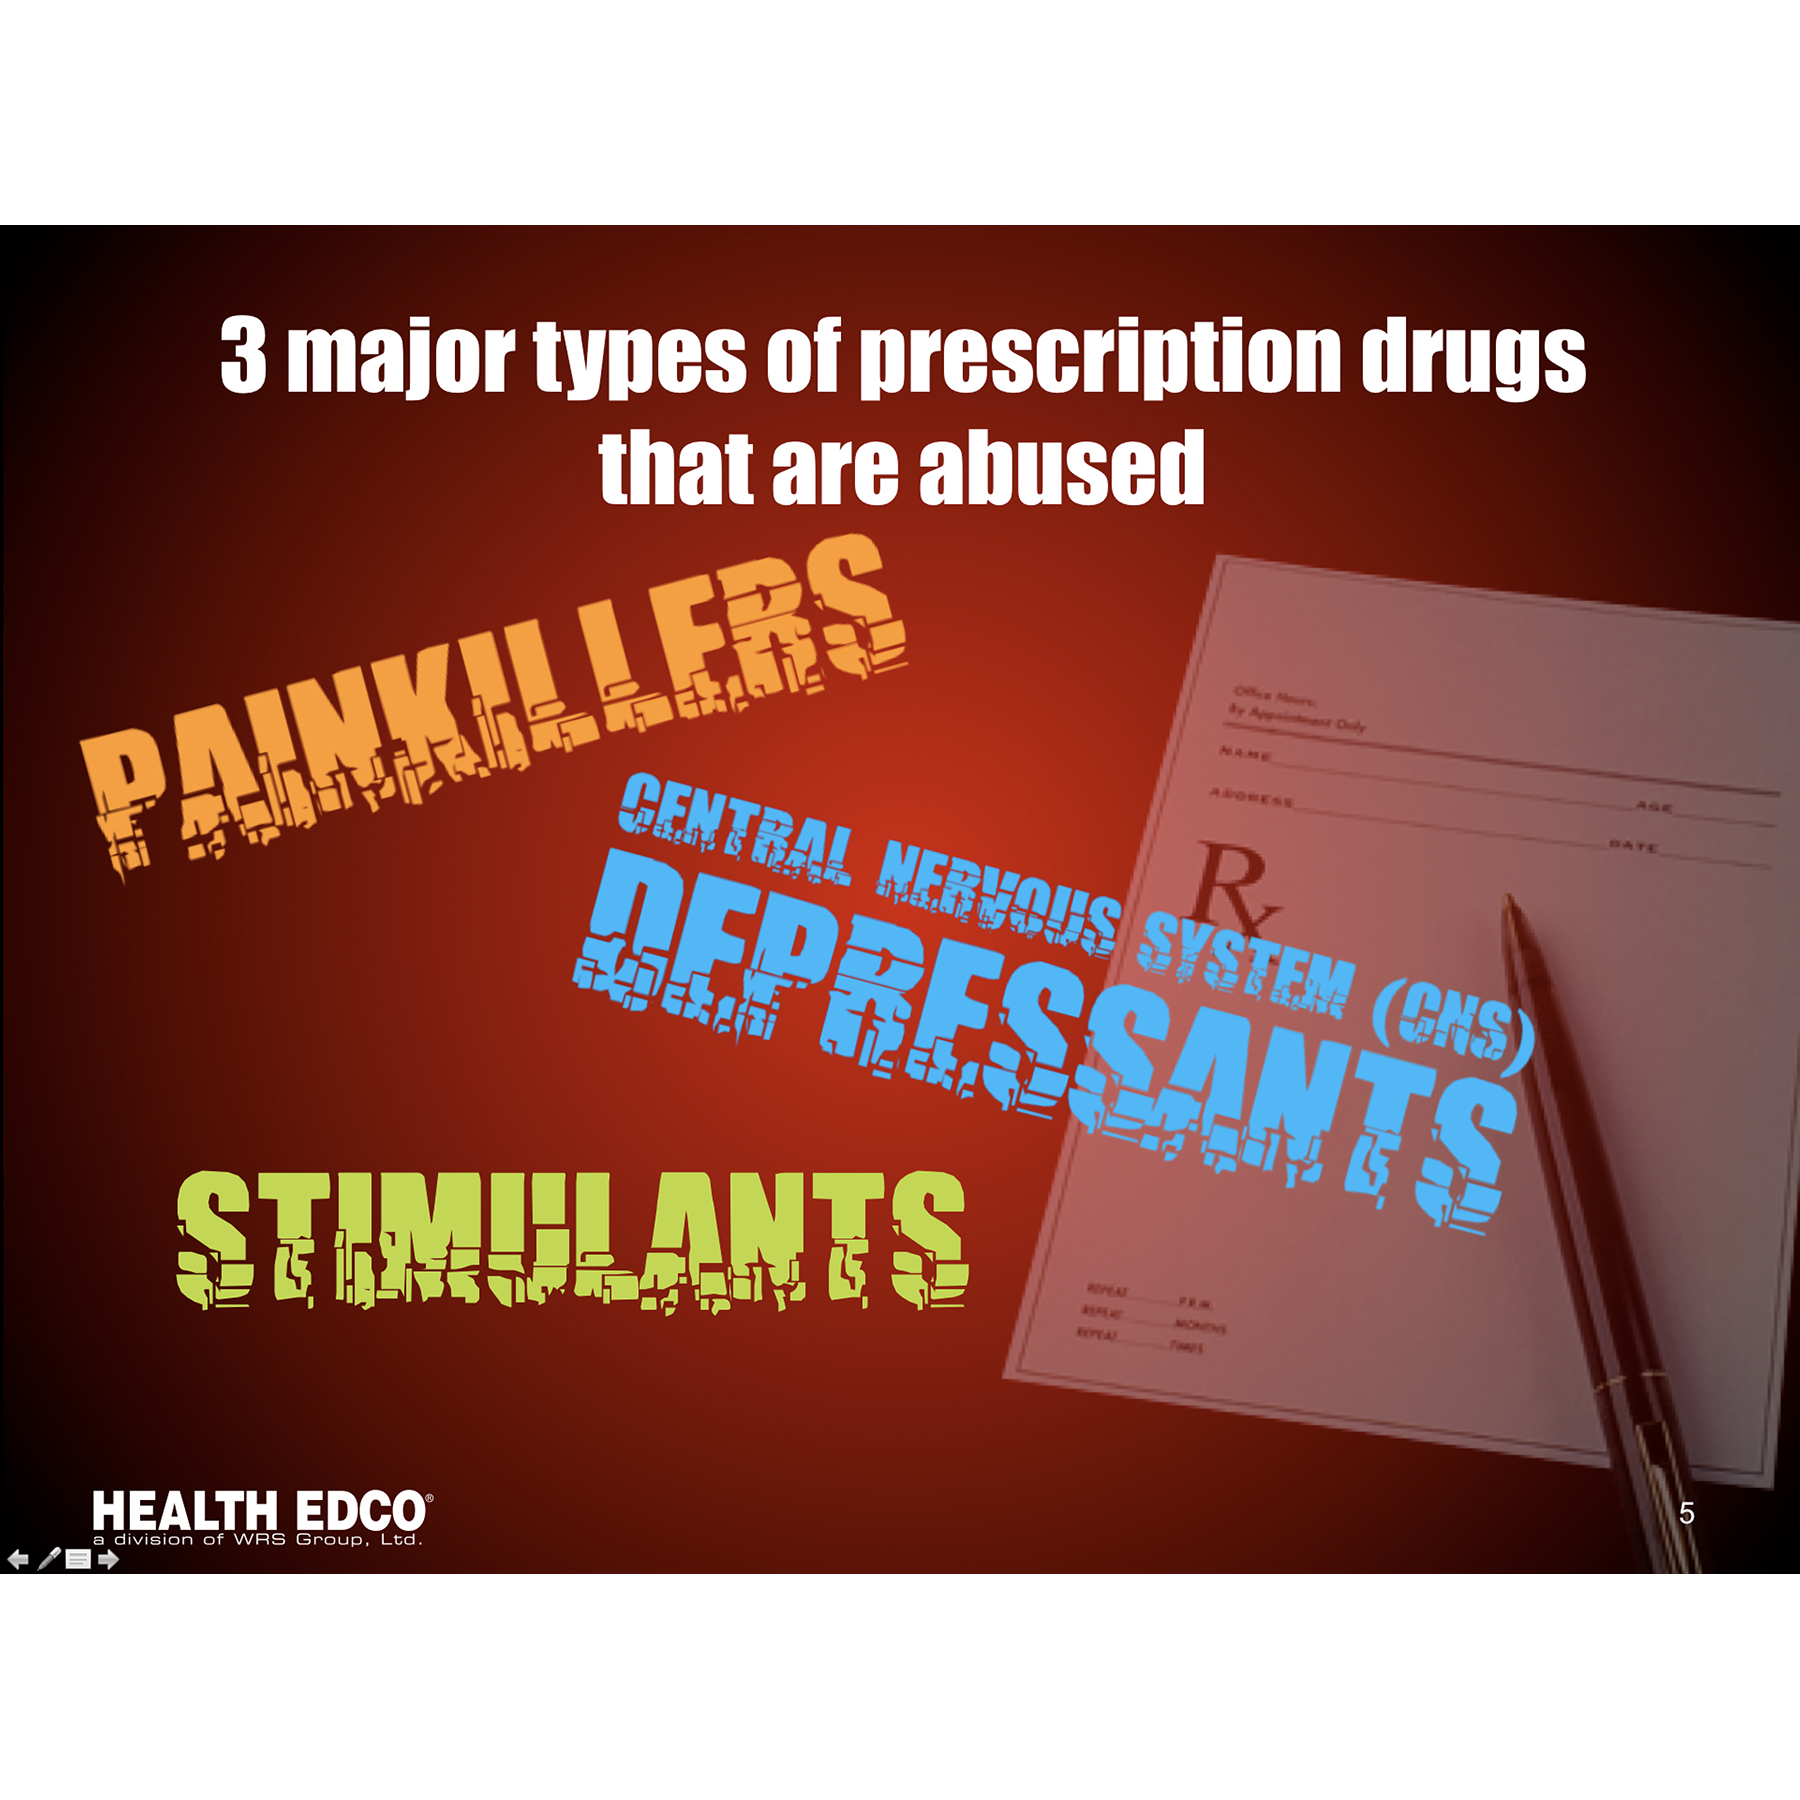 Prescription & OTC Drug Abuse PowerPoint | Health Edco